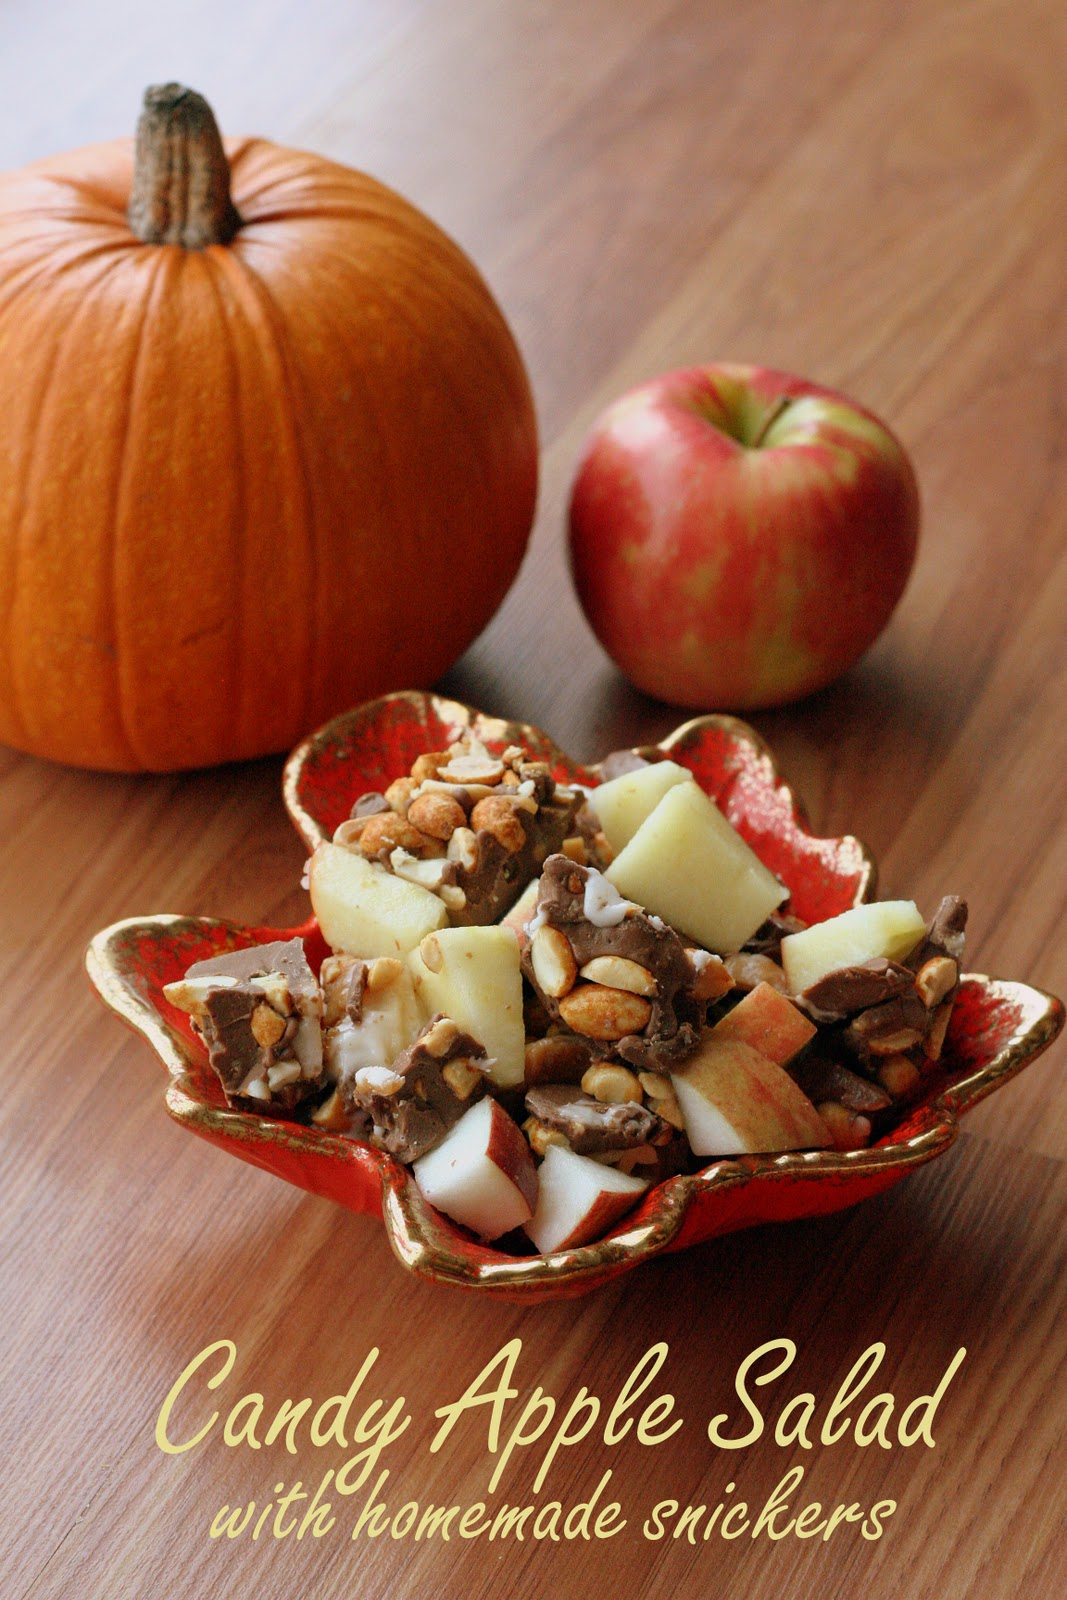 Homemade Snickers Bar Apple Salad